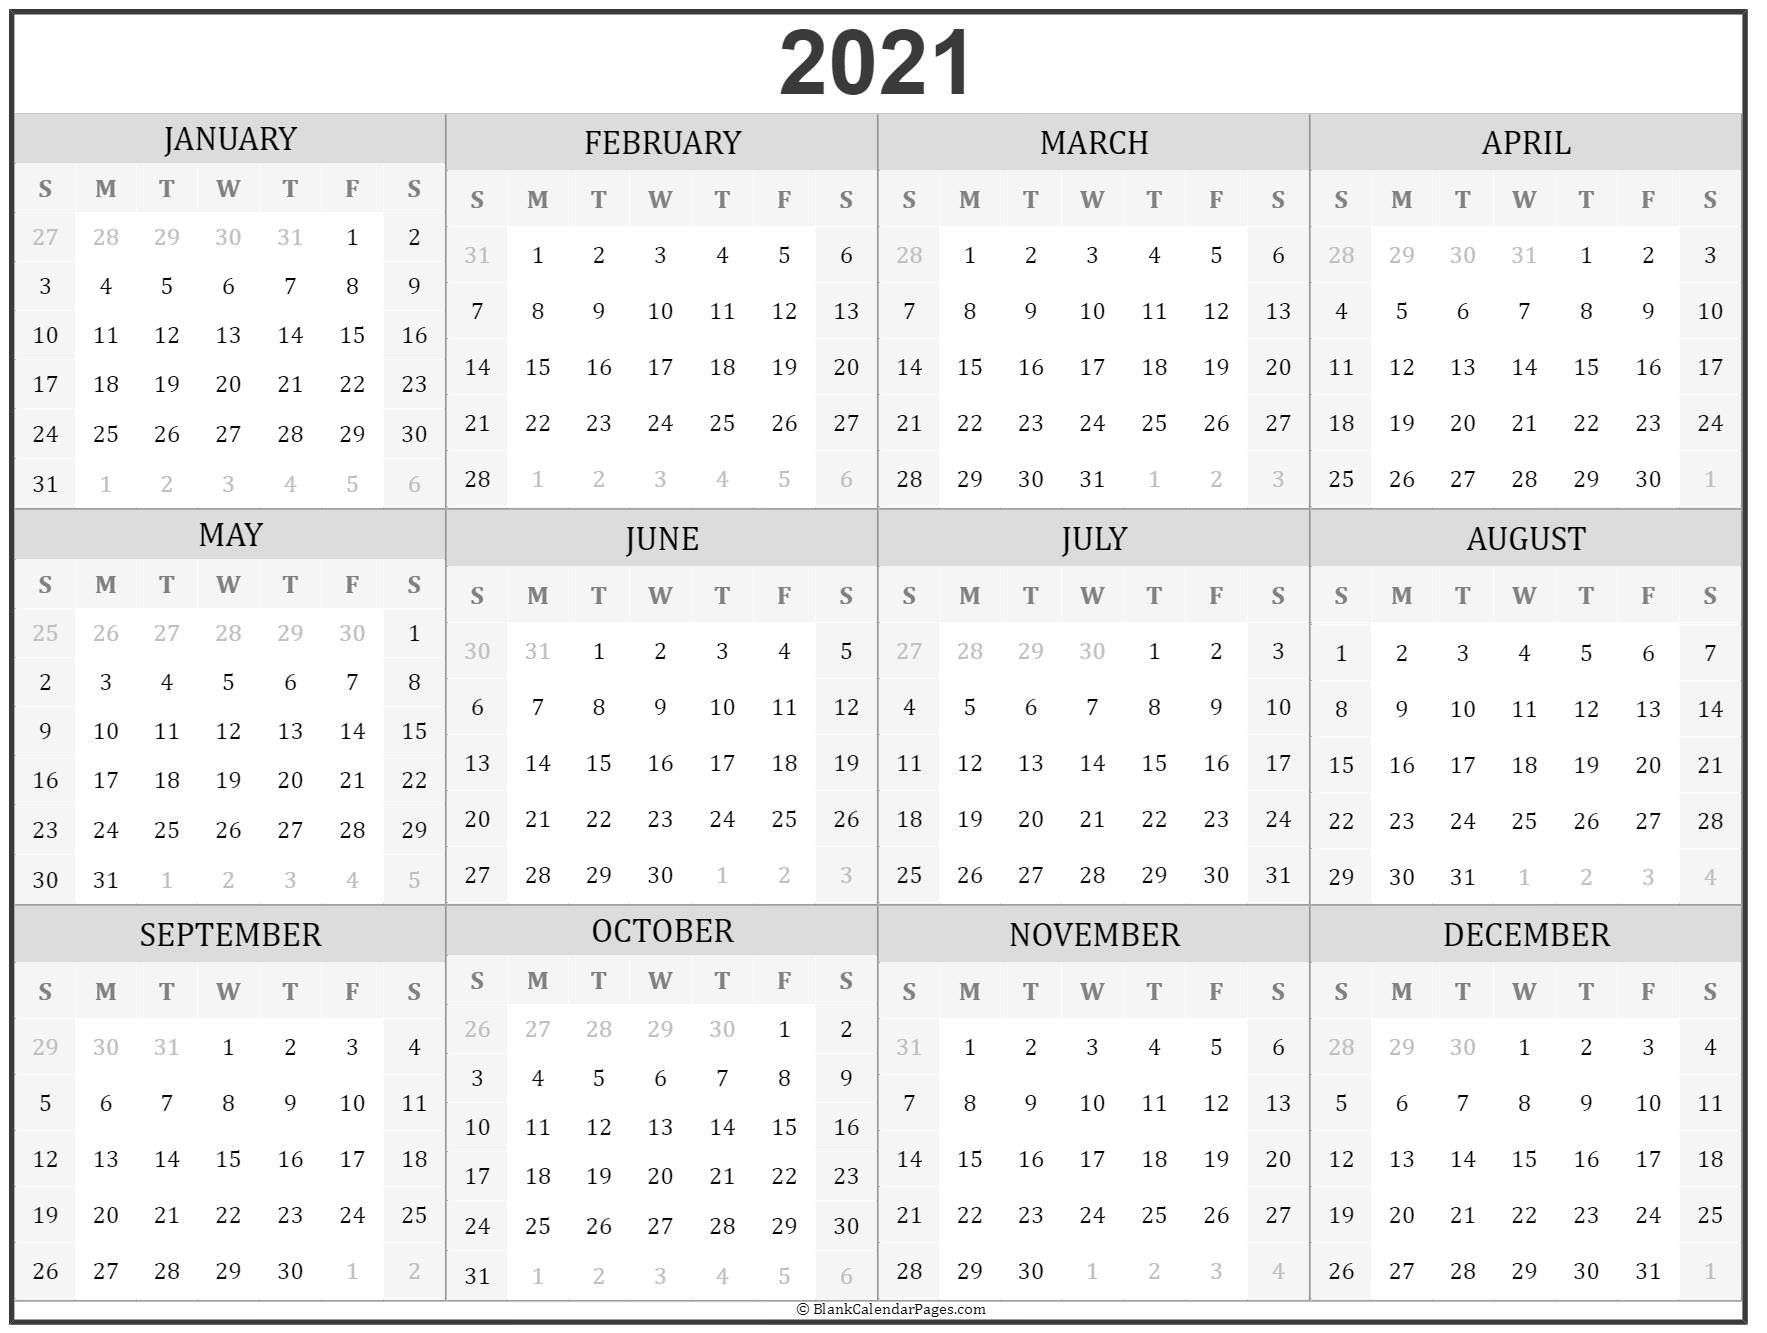 2021 Year Calendar | Yearly Printable regarding 2021 Australian Calendars To Print Photo